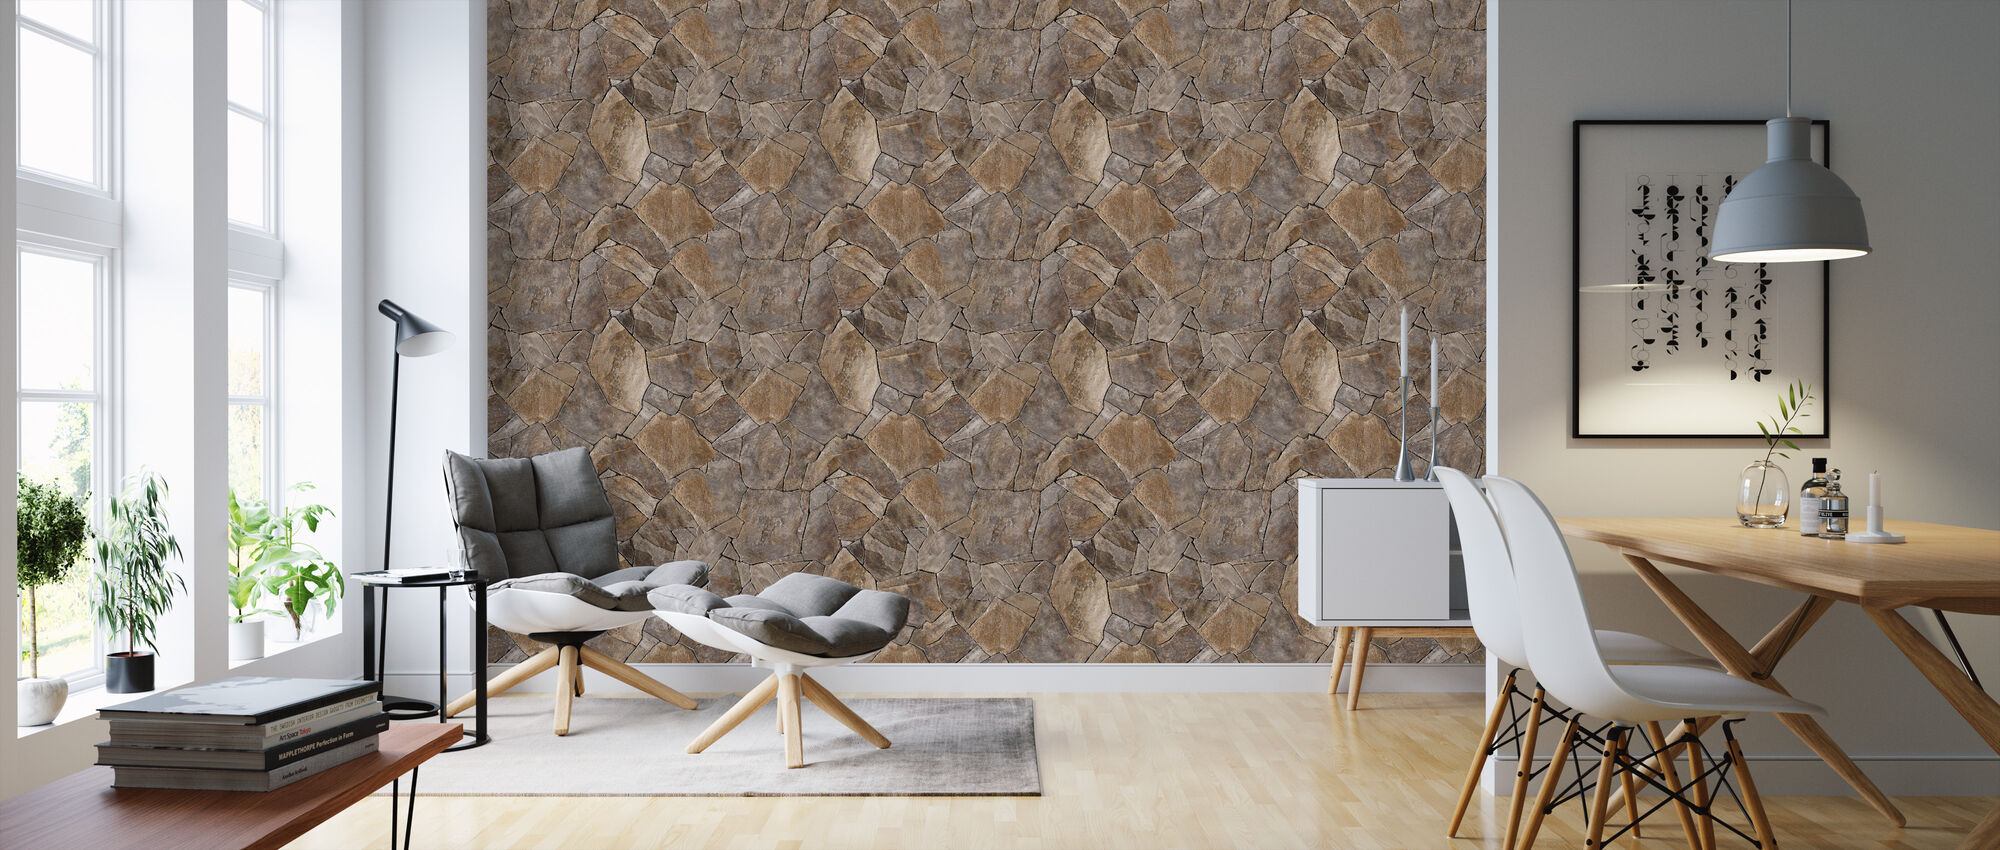 perfect stone wall eine tapete f r jeden raum und jedes ambiente photowall. Black Bedroom Furniture Sets. Home Design Ideas